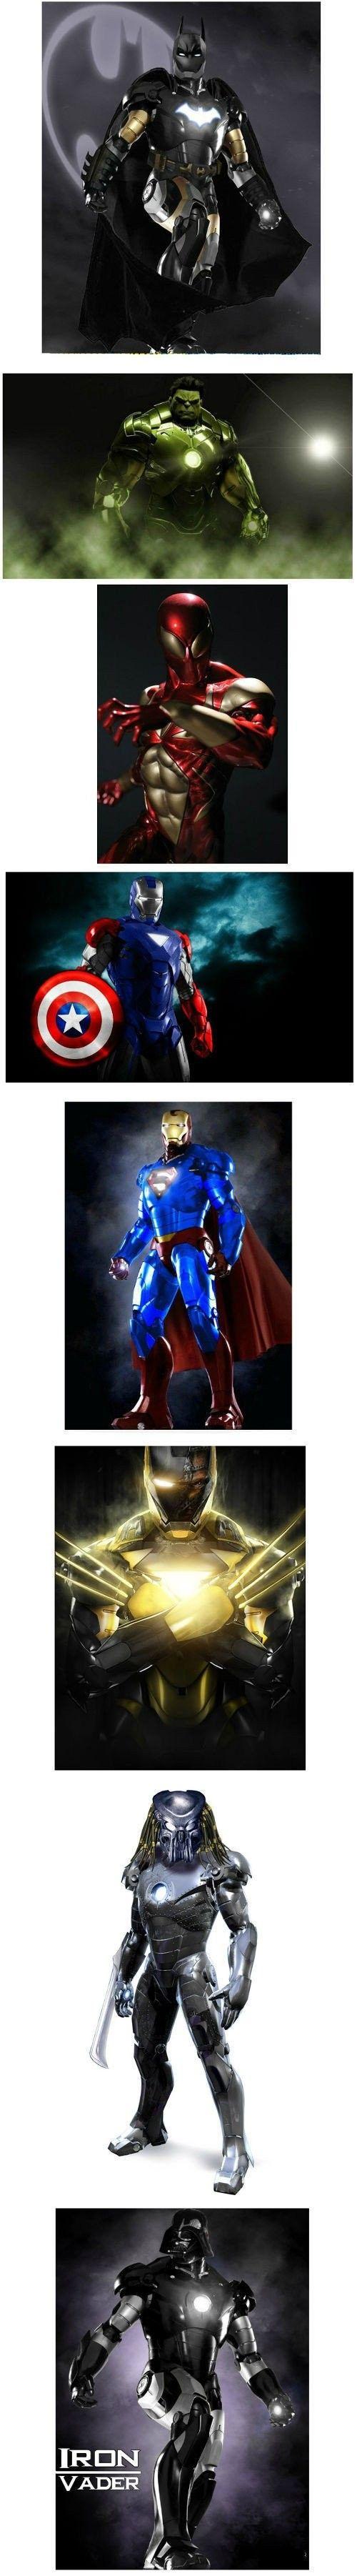 Iron Man Mashups